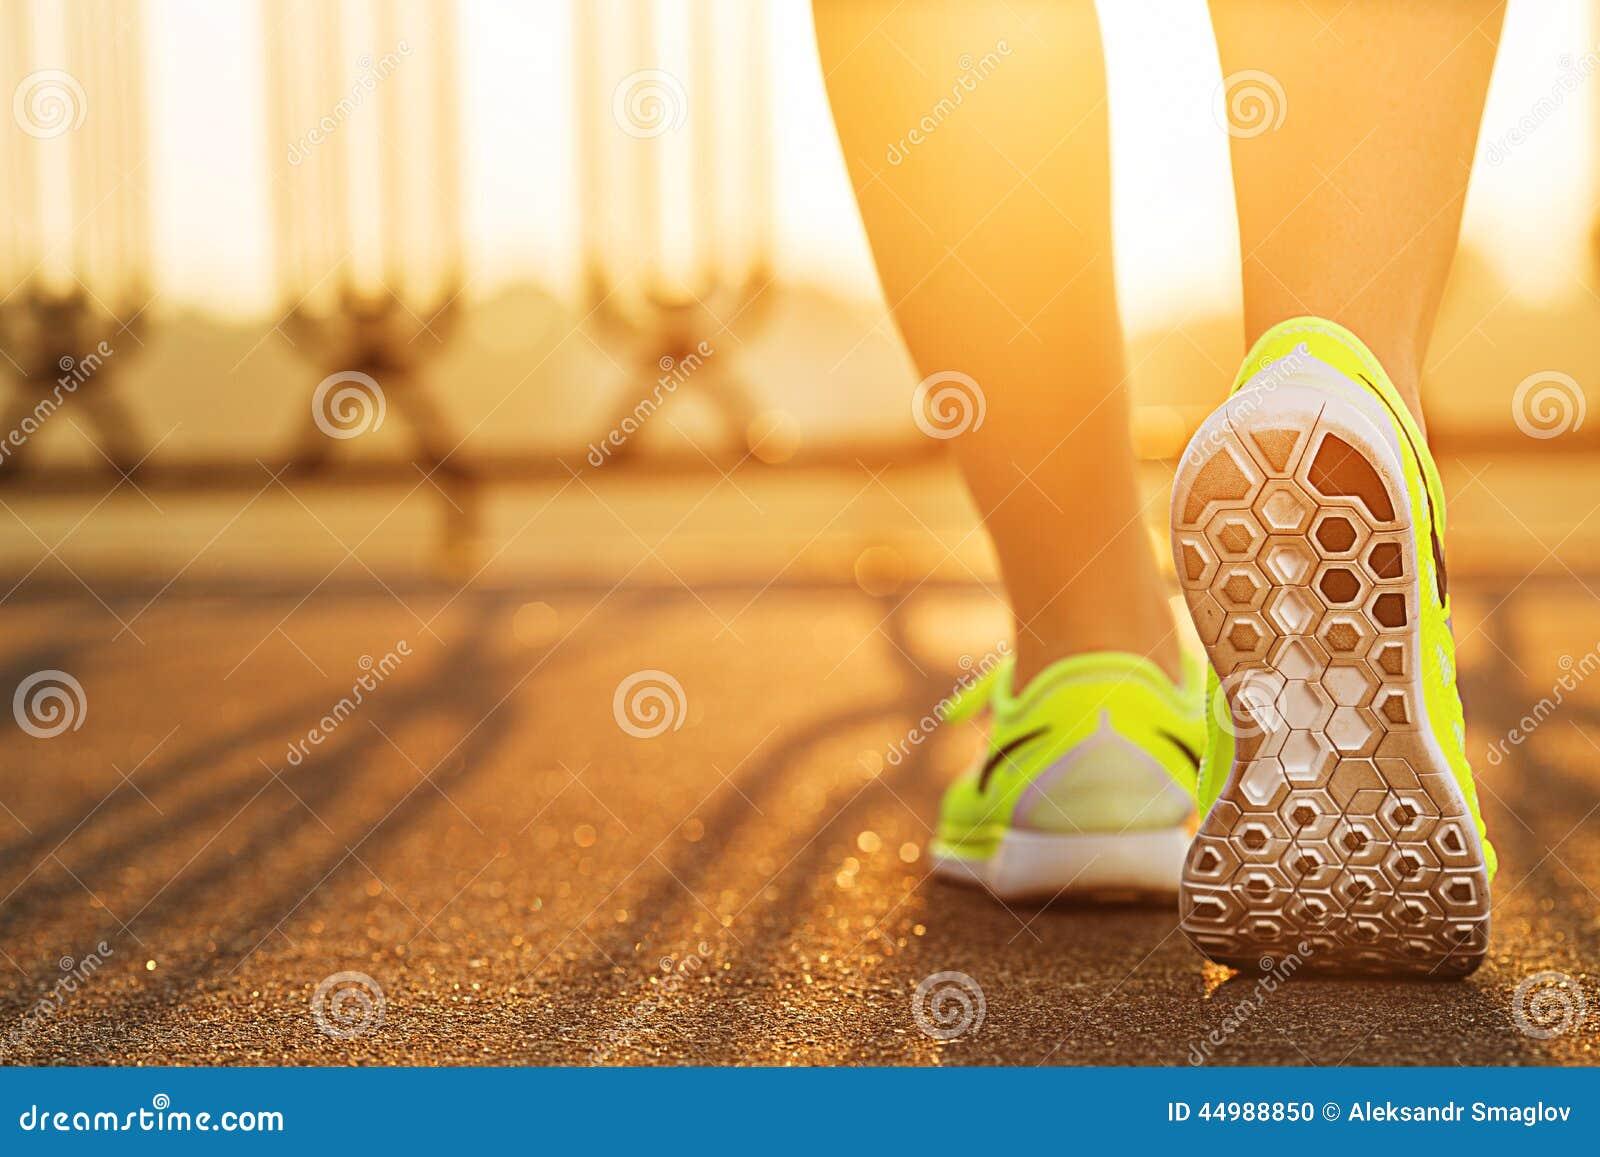 Runner woman feet running on road closeup on shoe. Female fitness model sunrise jog workout. Sports lifestyle concept.